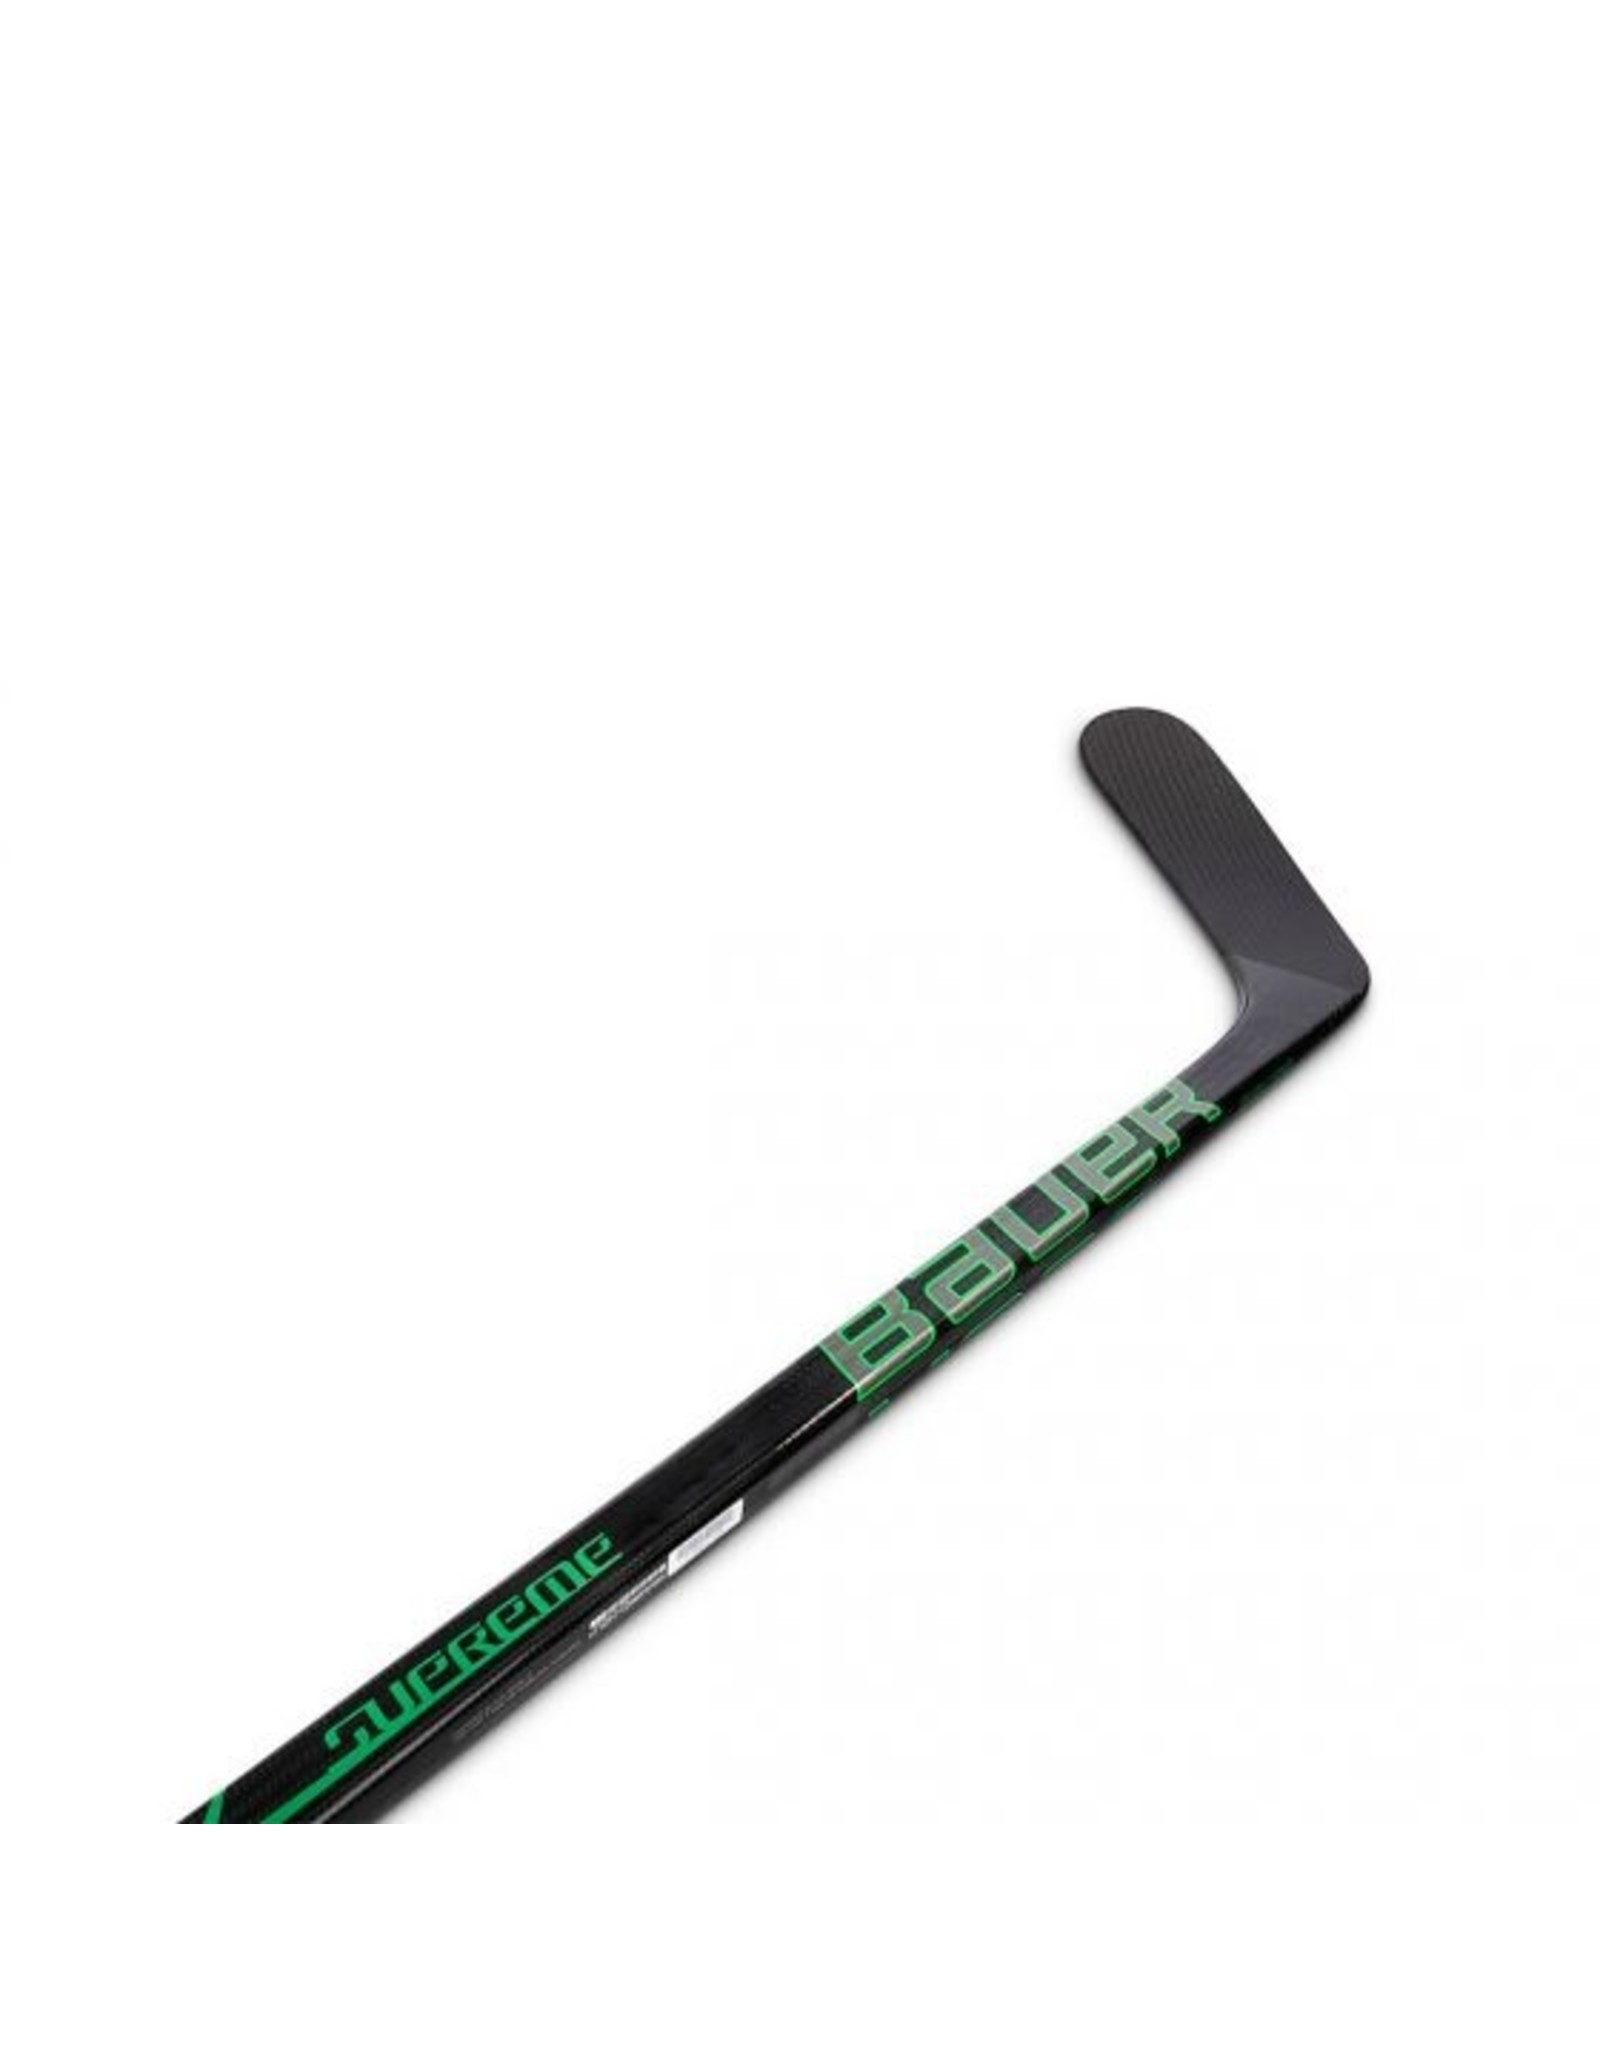 Bauer Hockey - Canada BAUER S20 SUPREME IGNITE PRO + SR OPS